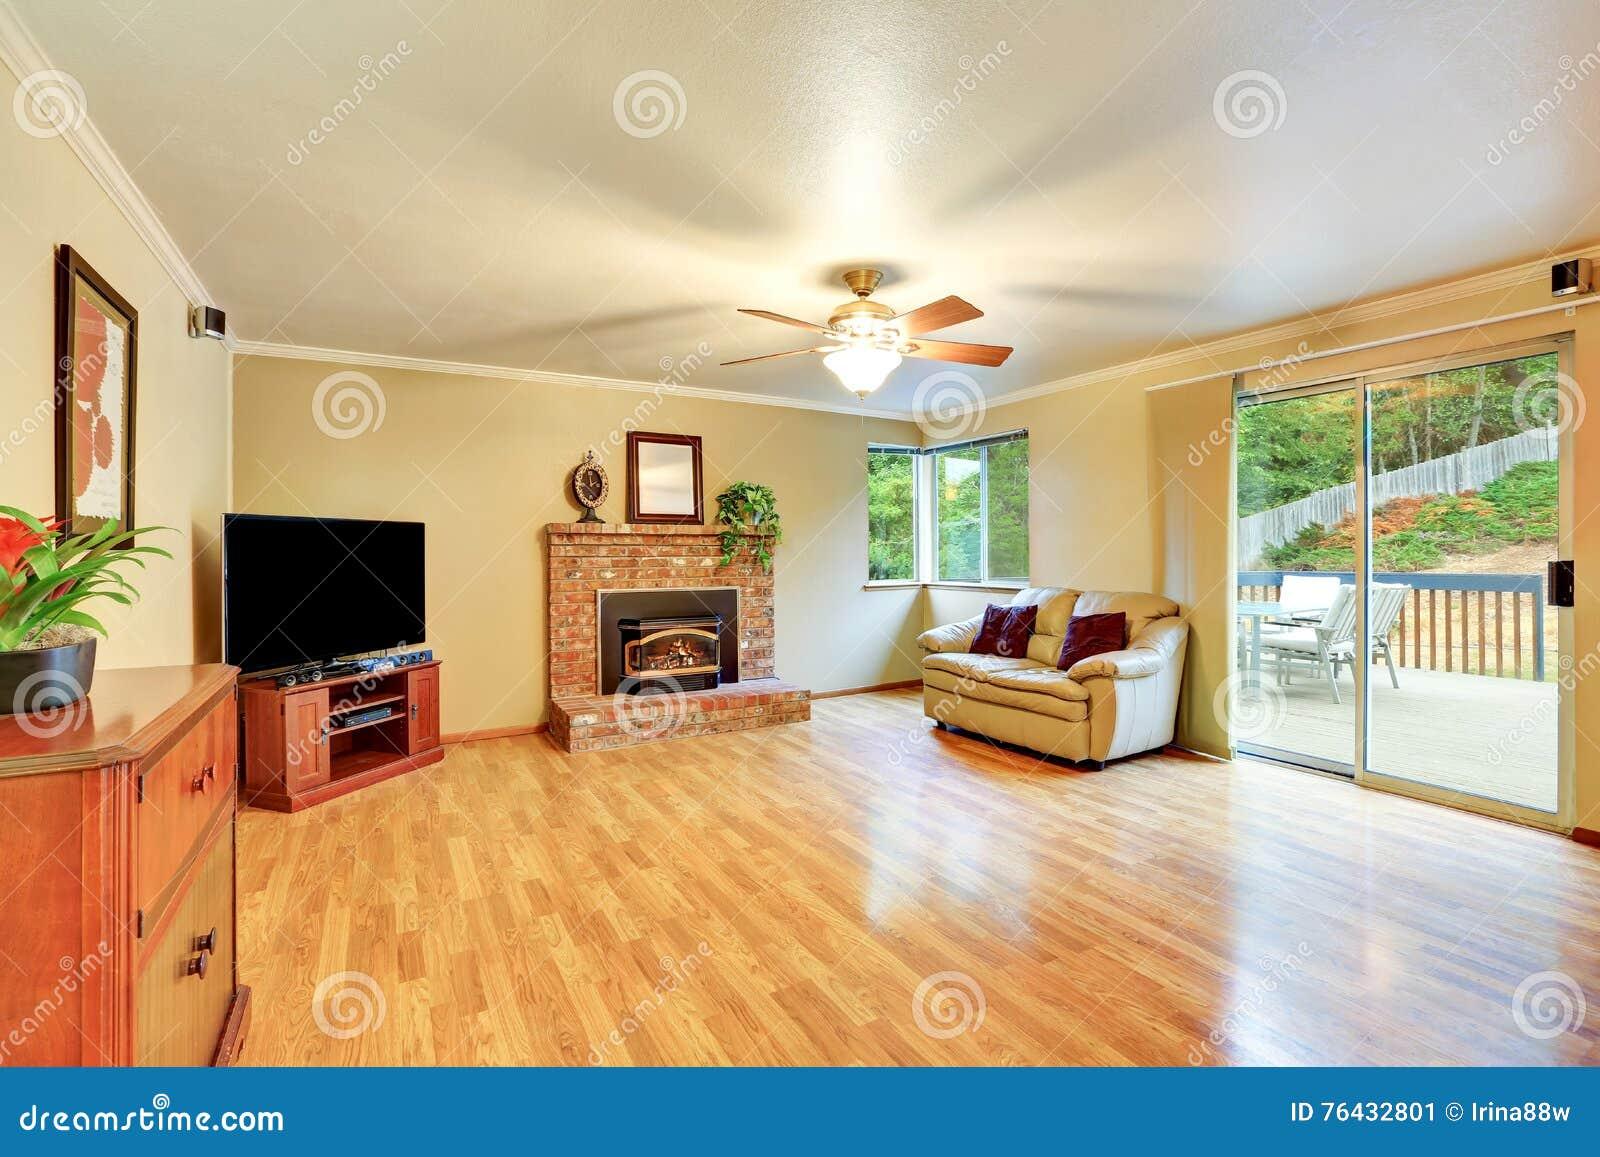 Cozy Hardwood Living Room With Glass Door Exit To The Deck Stock